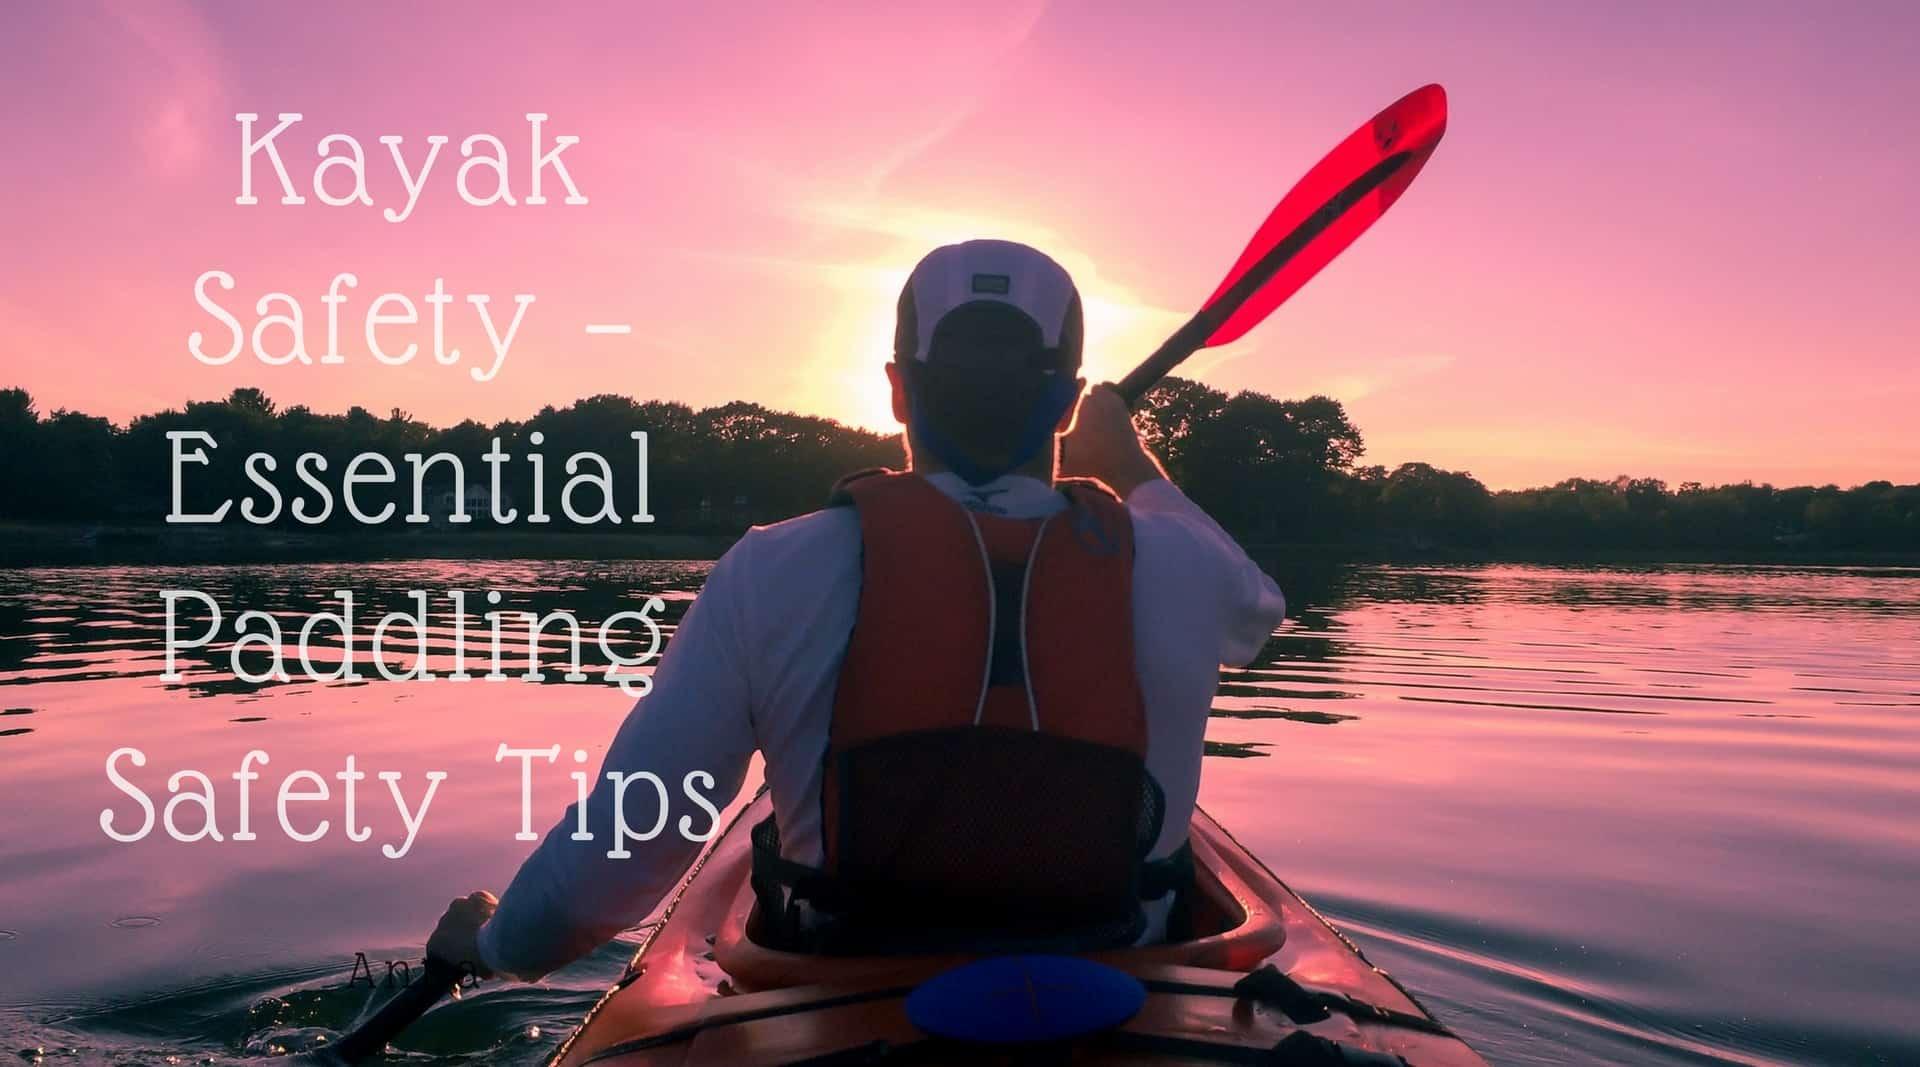 Kayak Safety - Essential Paddling Safety Tips